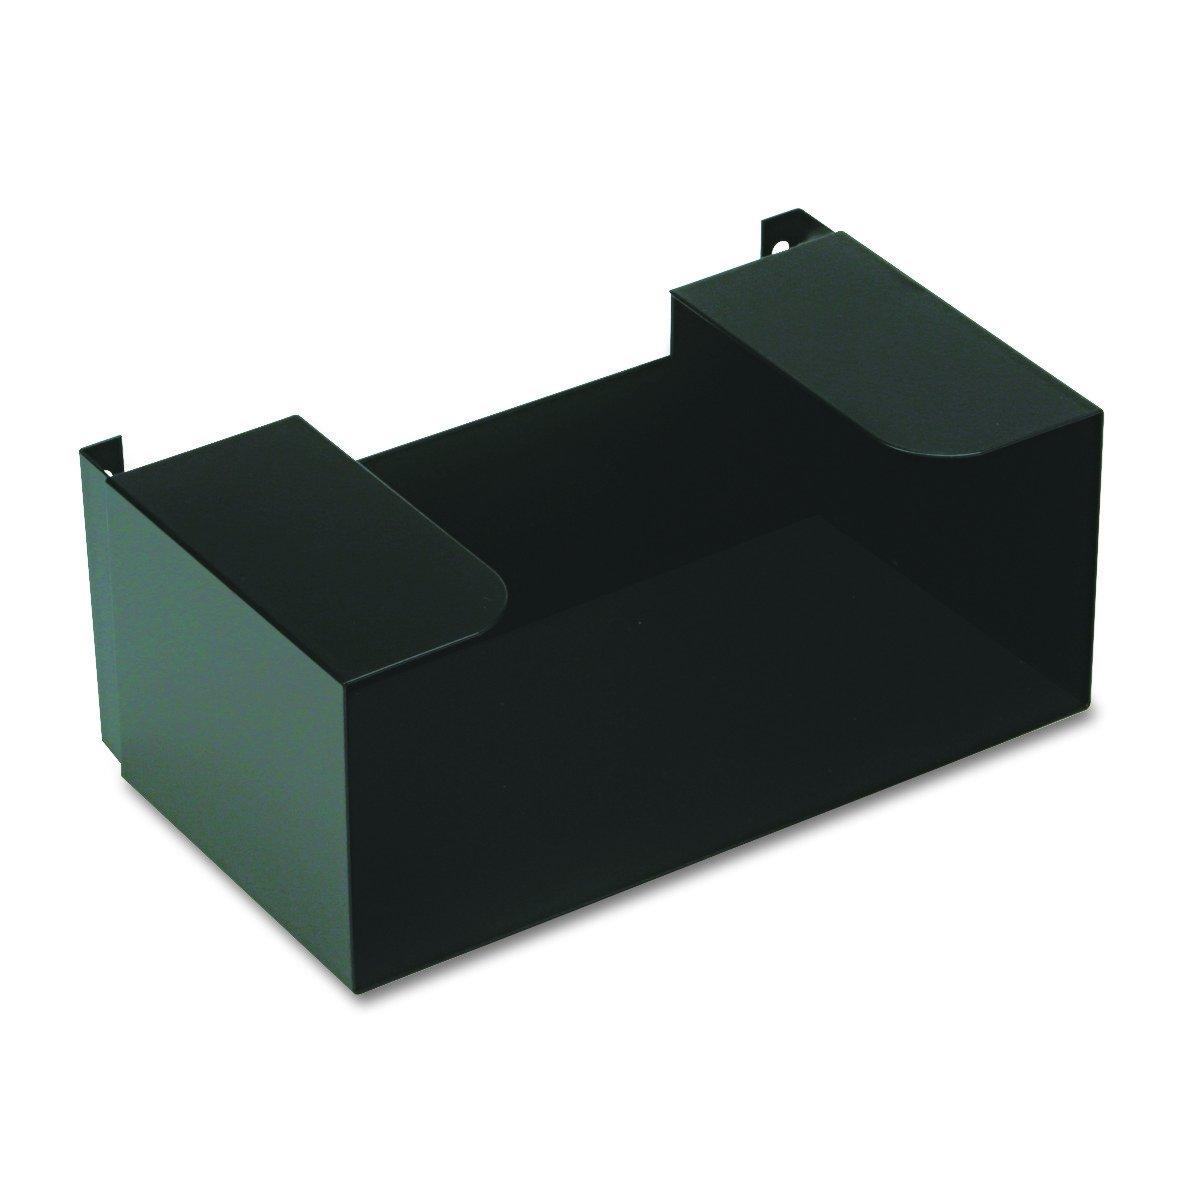 MMF Industries Steel Deposit Ticket Holder, Powder Coated Finish, 10 x 4 x 6 Inches, Black (268067004)